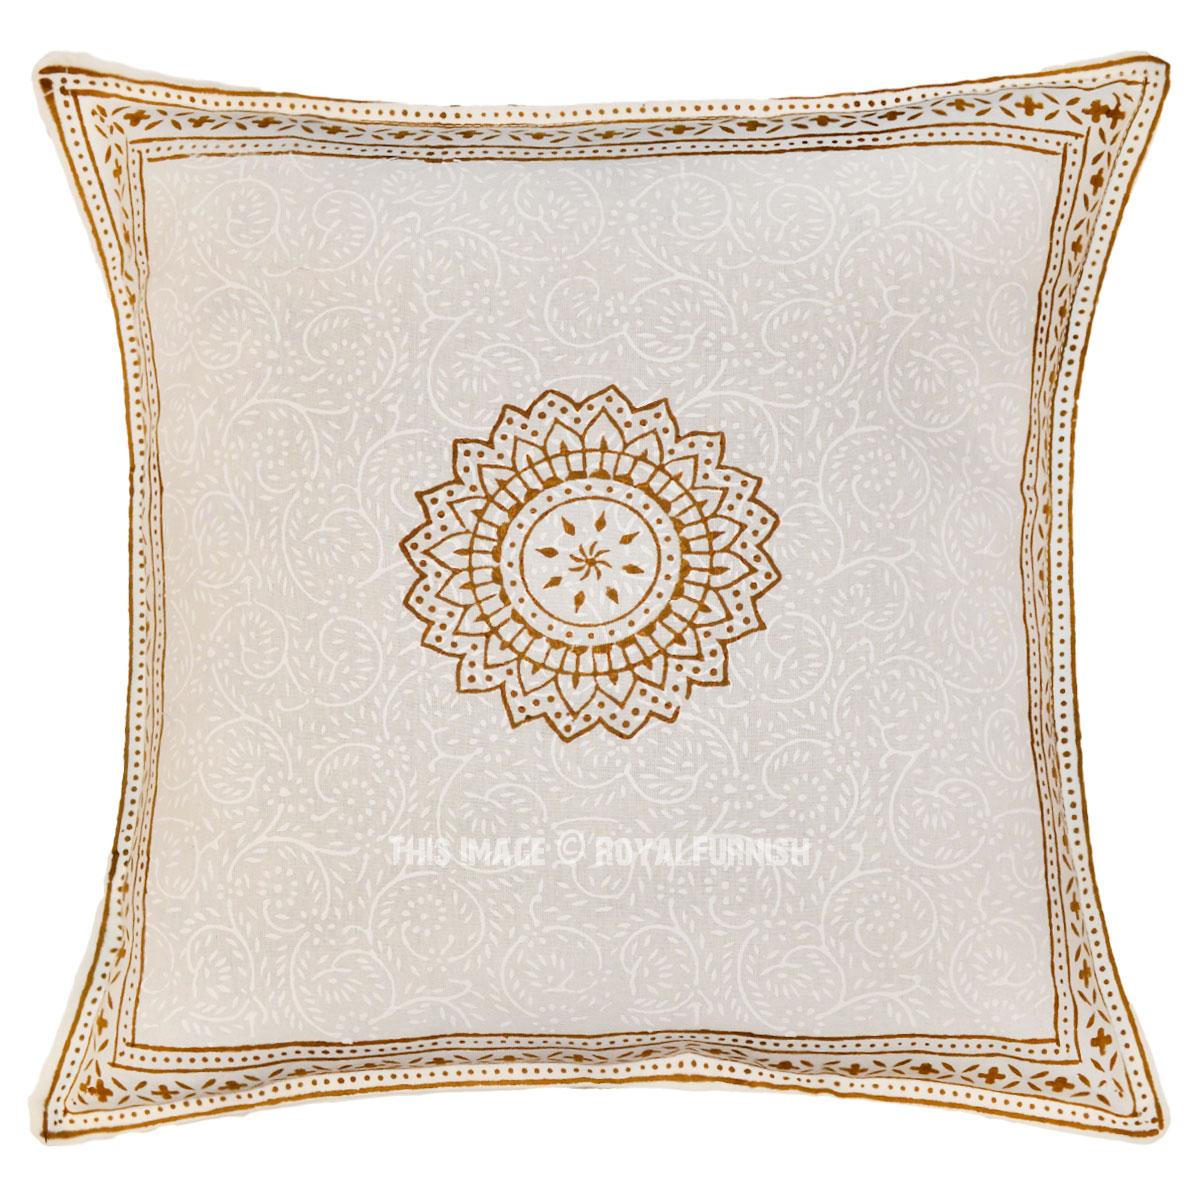 White & Brown Sunflower Printed Cotton Throw Pillow Sham 16X16 Inch - RoyalFurnish.com